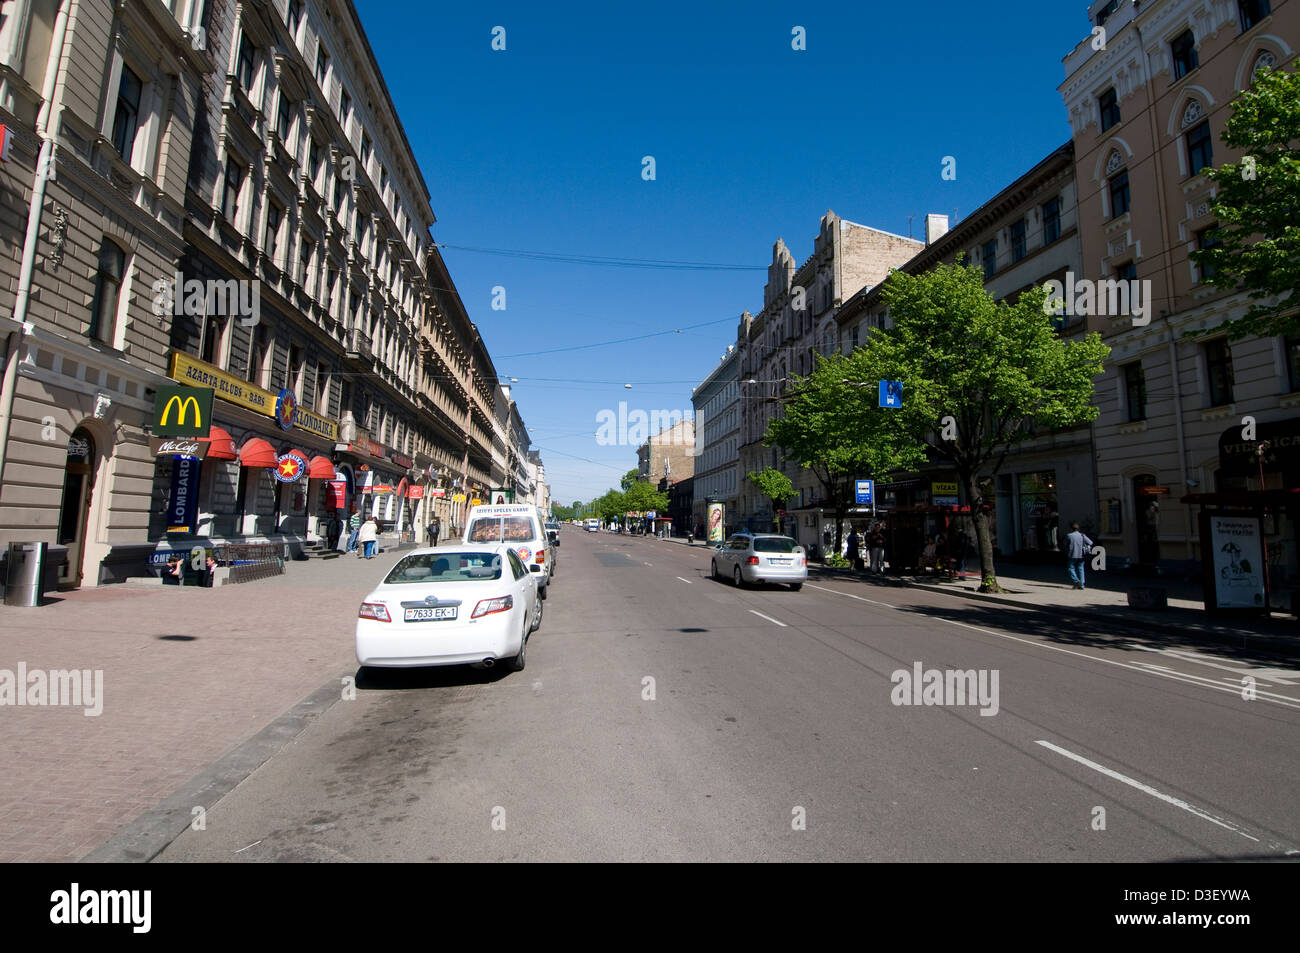 One of the main street, Merkela iela in Riga city, Latvia, Baltic States - Stock Image